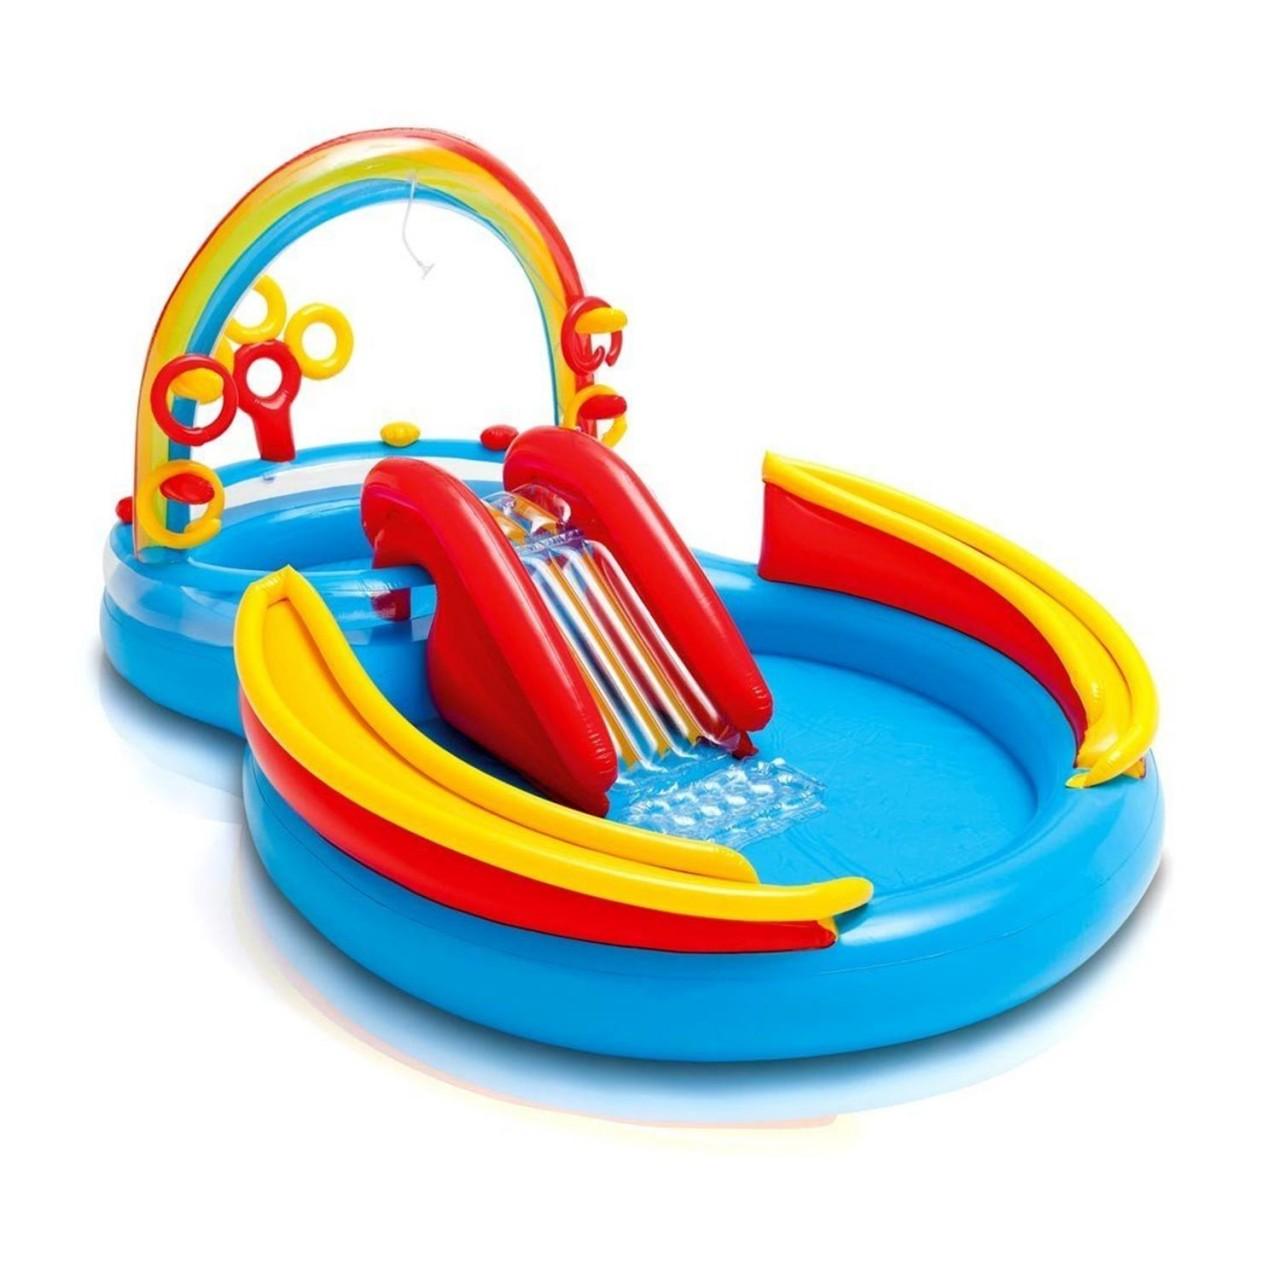 Intex 57453 Kinder Pool mit Rutsche Babypool Planschbecken Büllebad